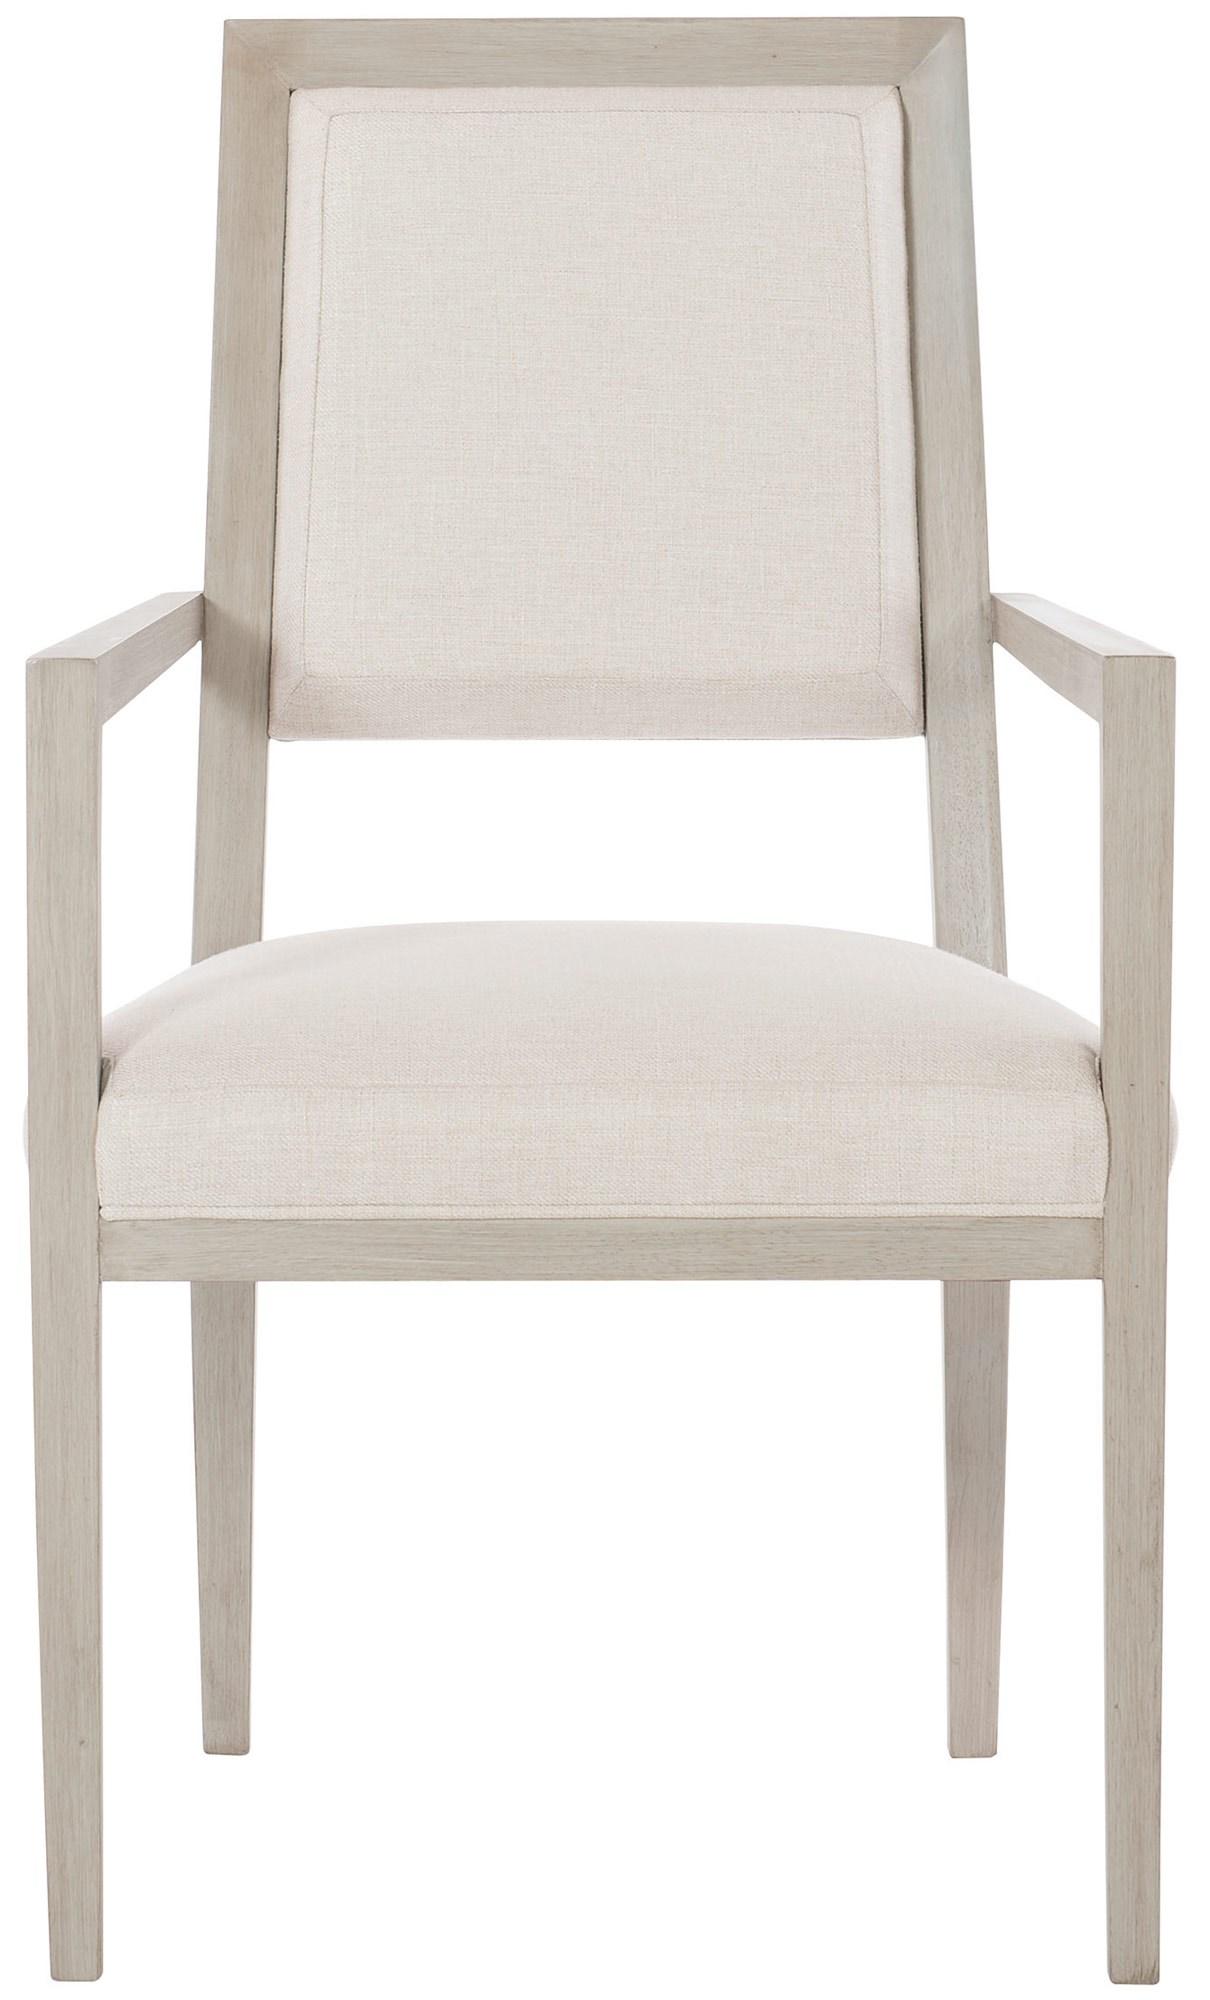 Axiom Arm Chair at Williams & Kay